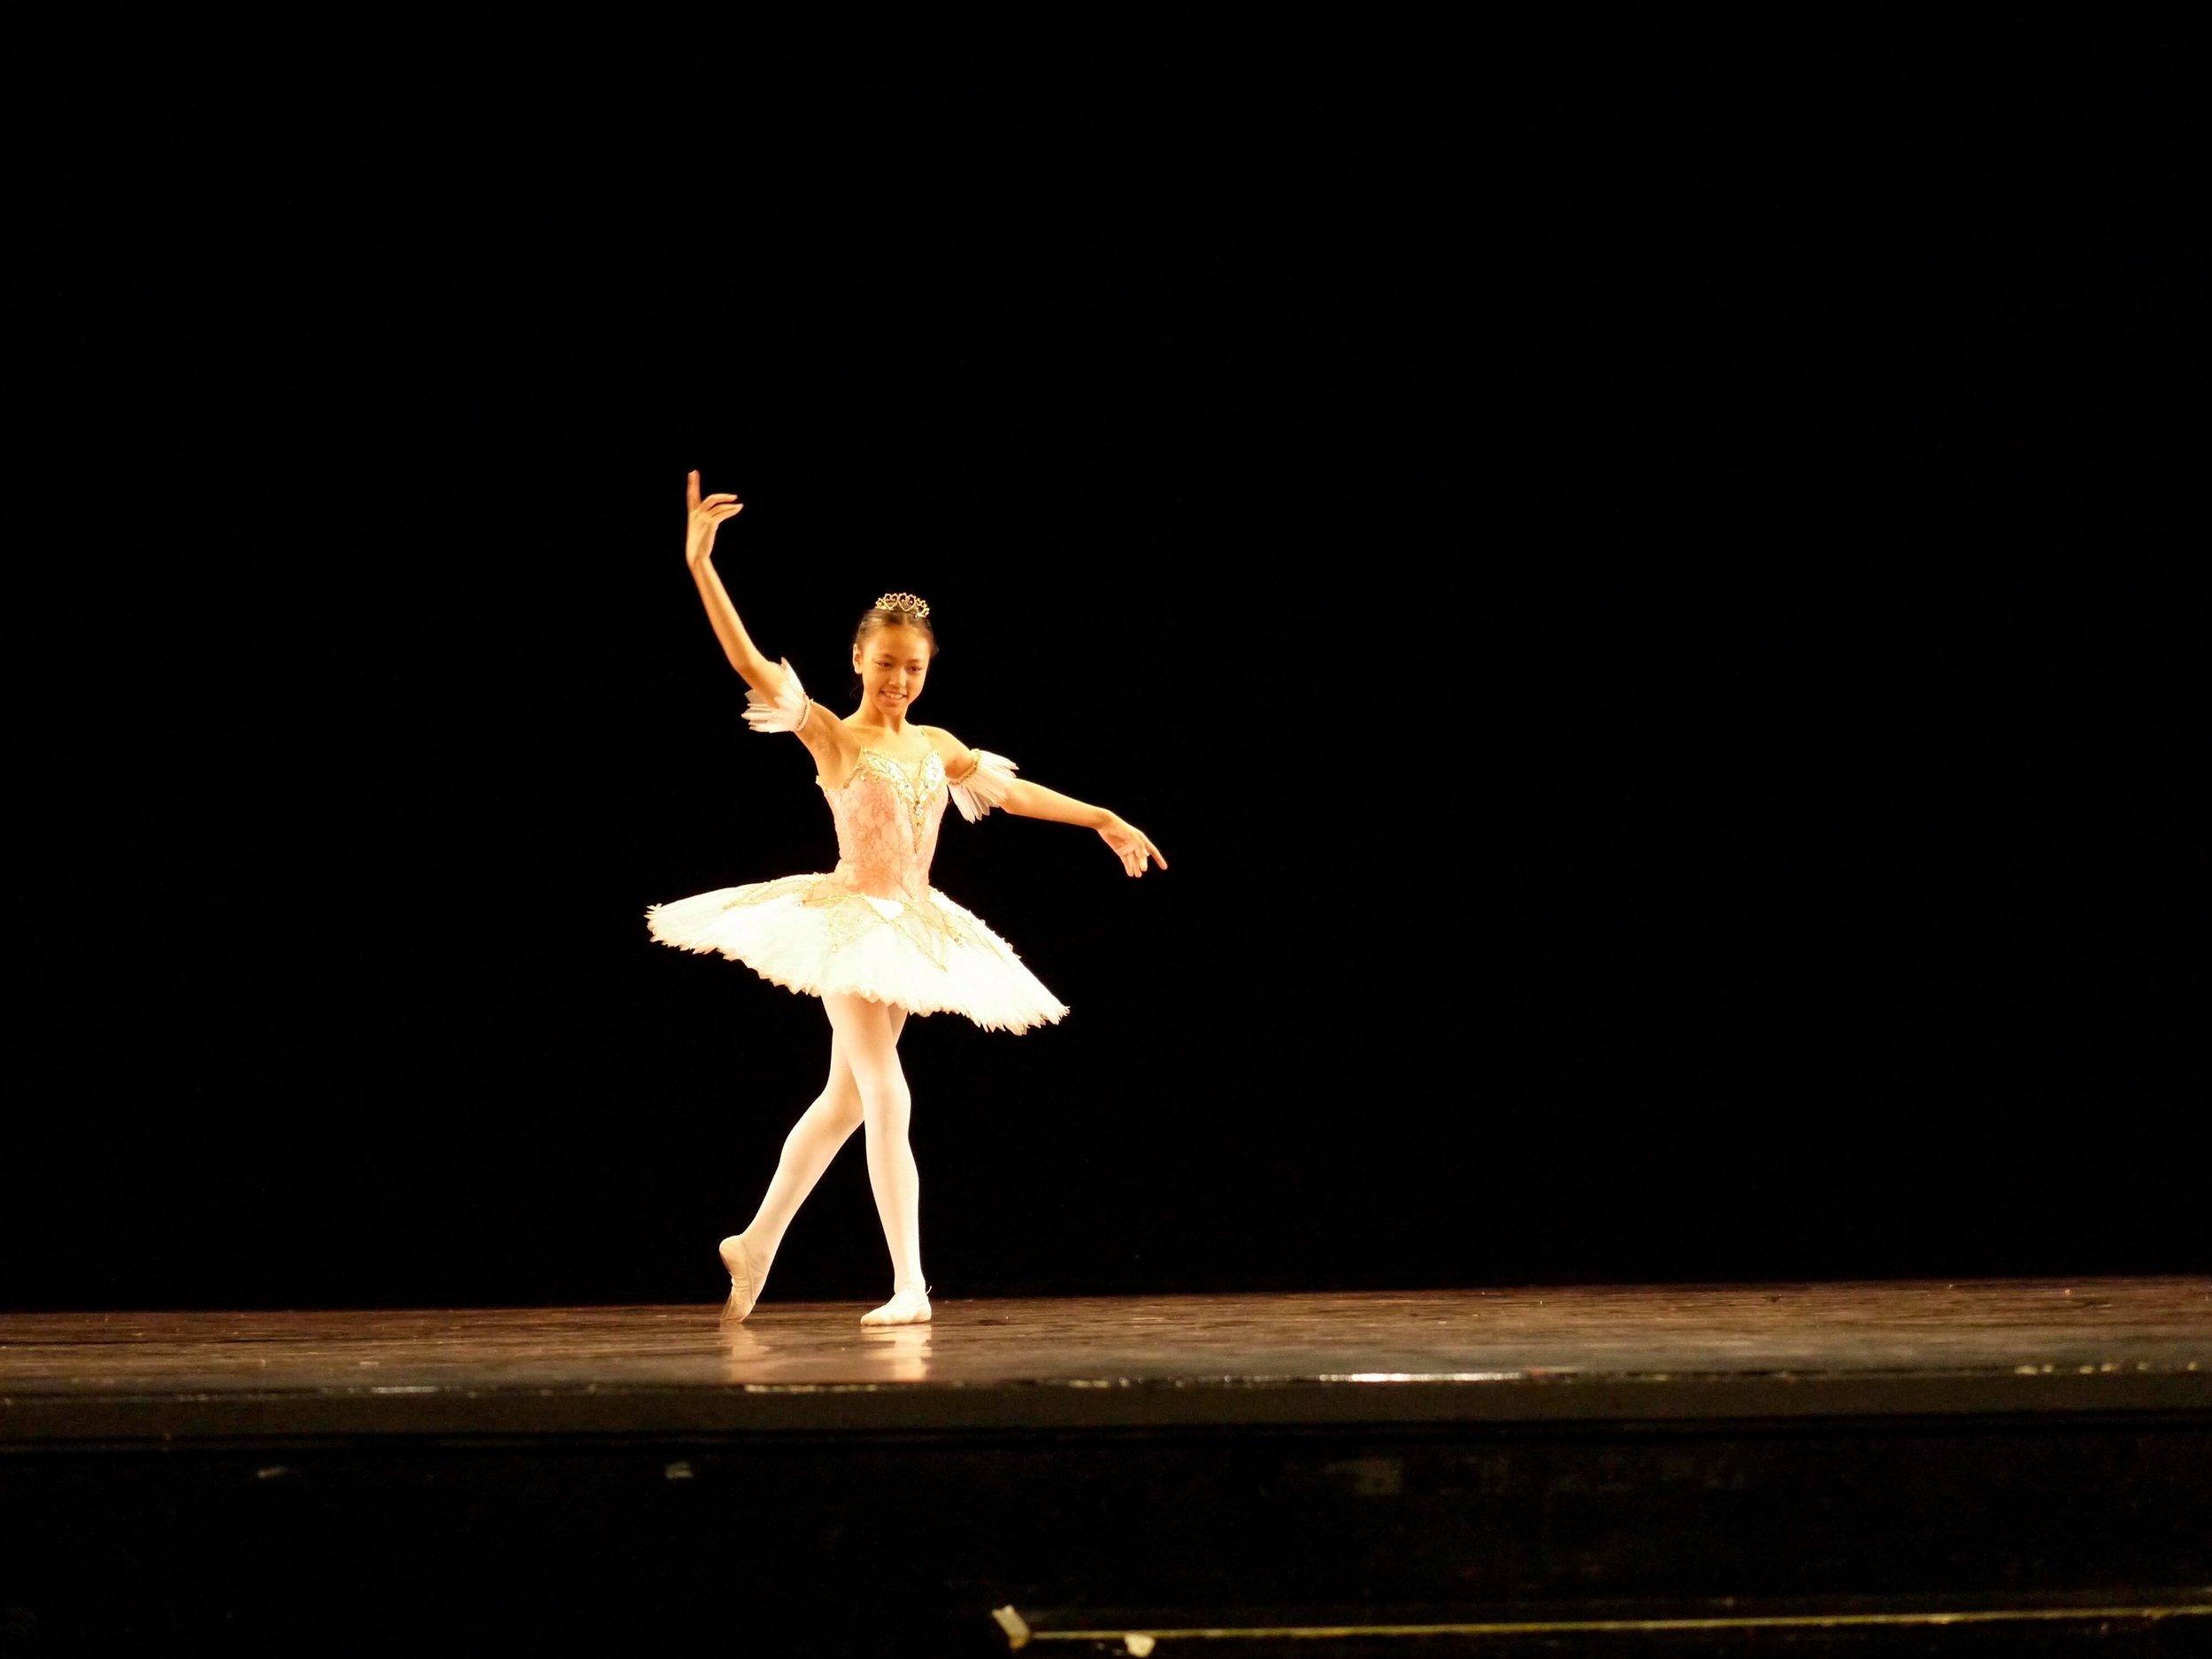 Loraine Gaile Jarlega – Pre-Competitive 3; Fairy Fleur de Farine     ( Sleeping Beauty ). Photo by Giselle P. Kasilag